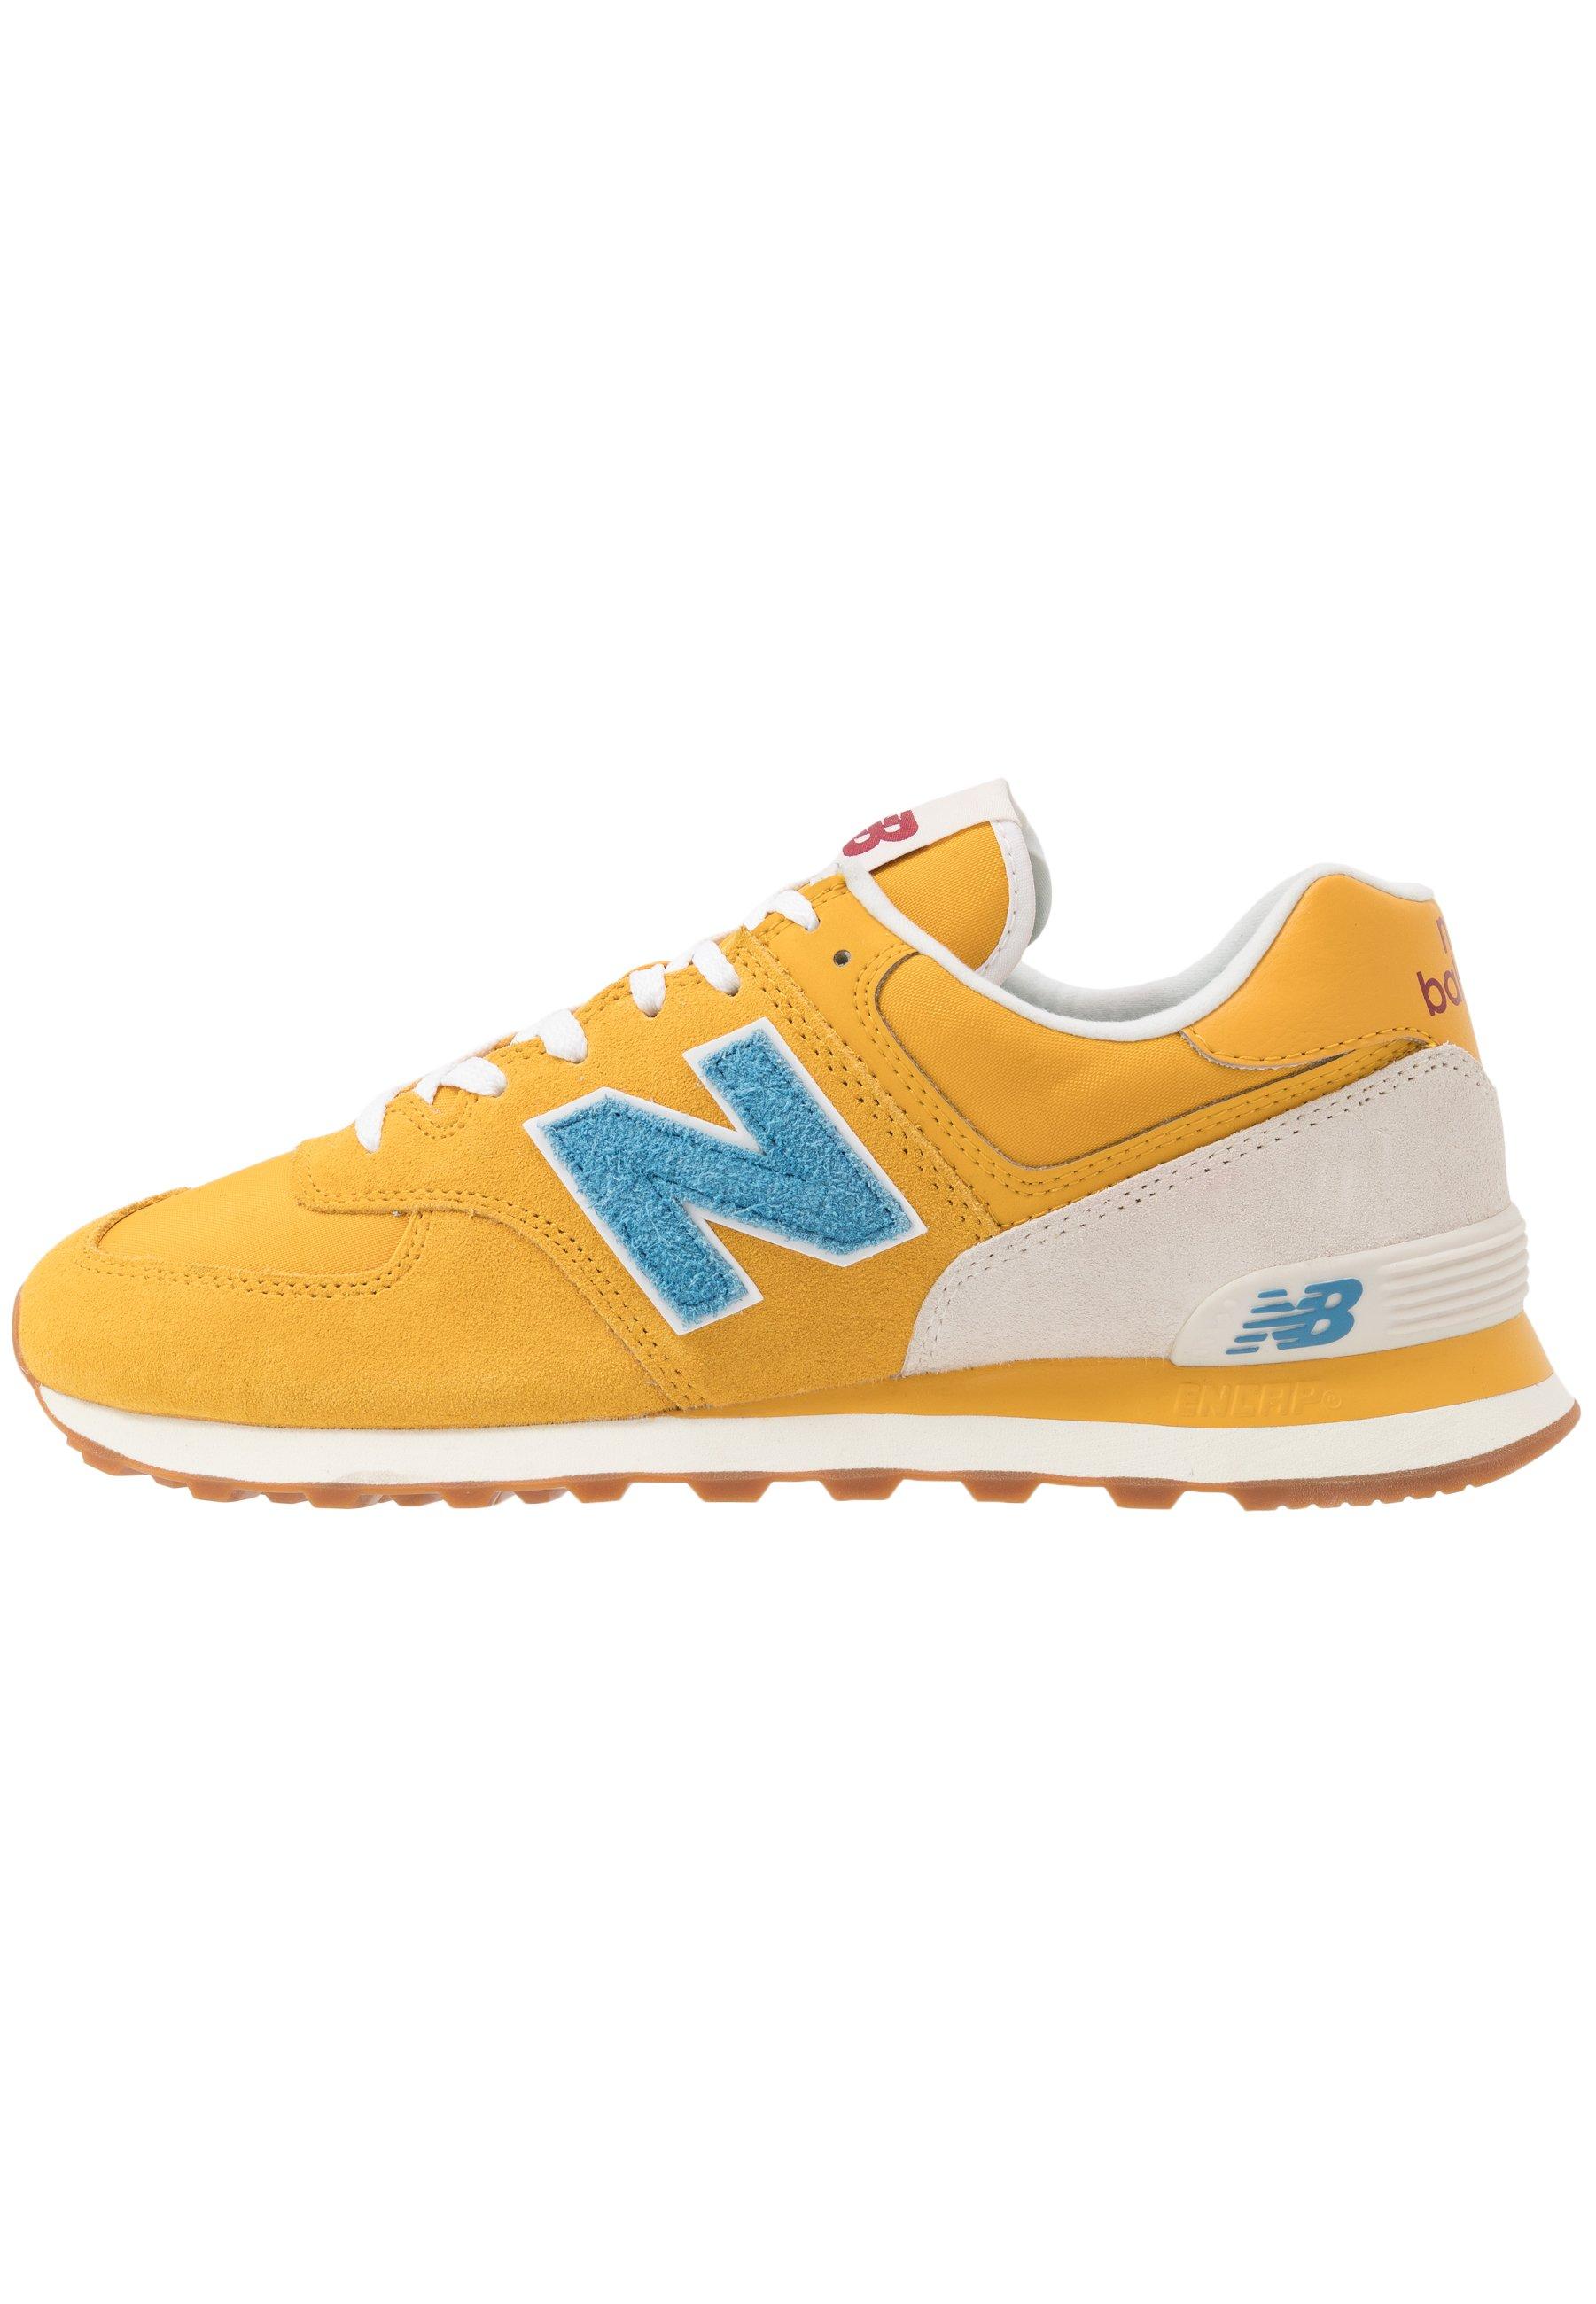 New Balance 574 - Sneakers basse - blue/yellow/giallo - Zalando.it